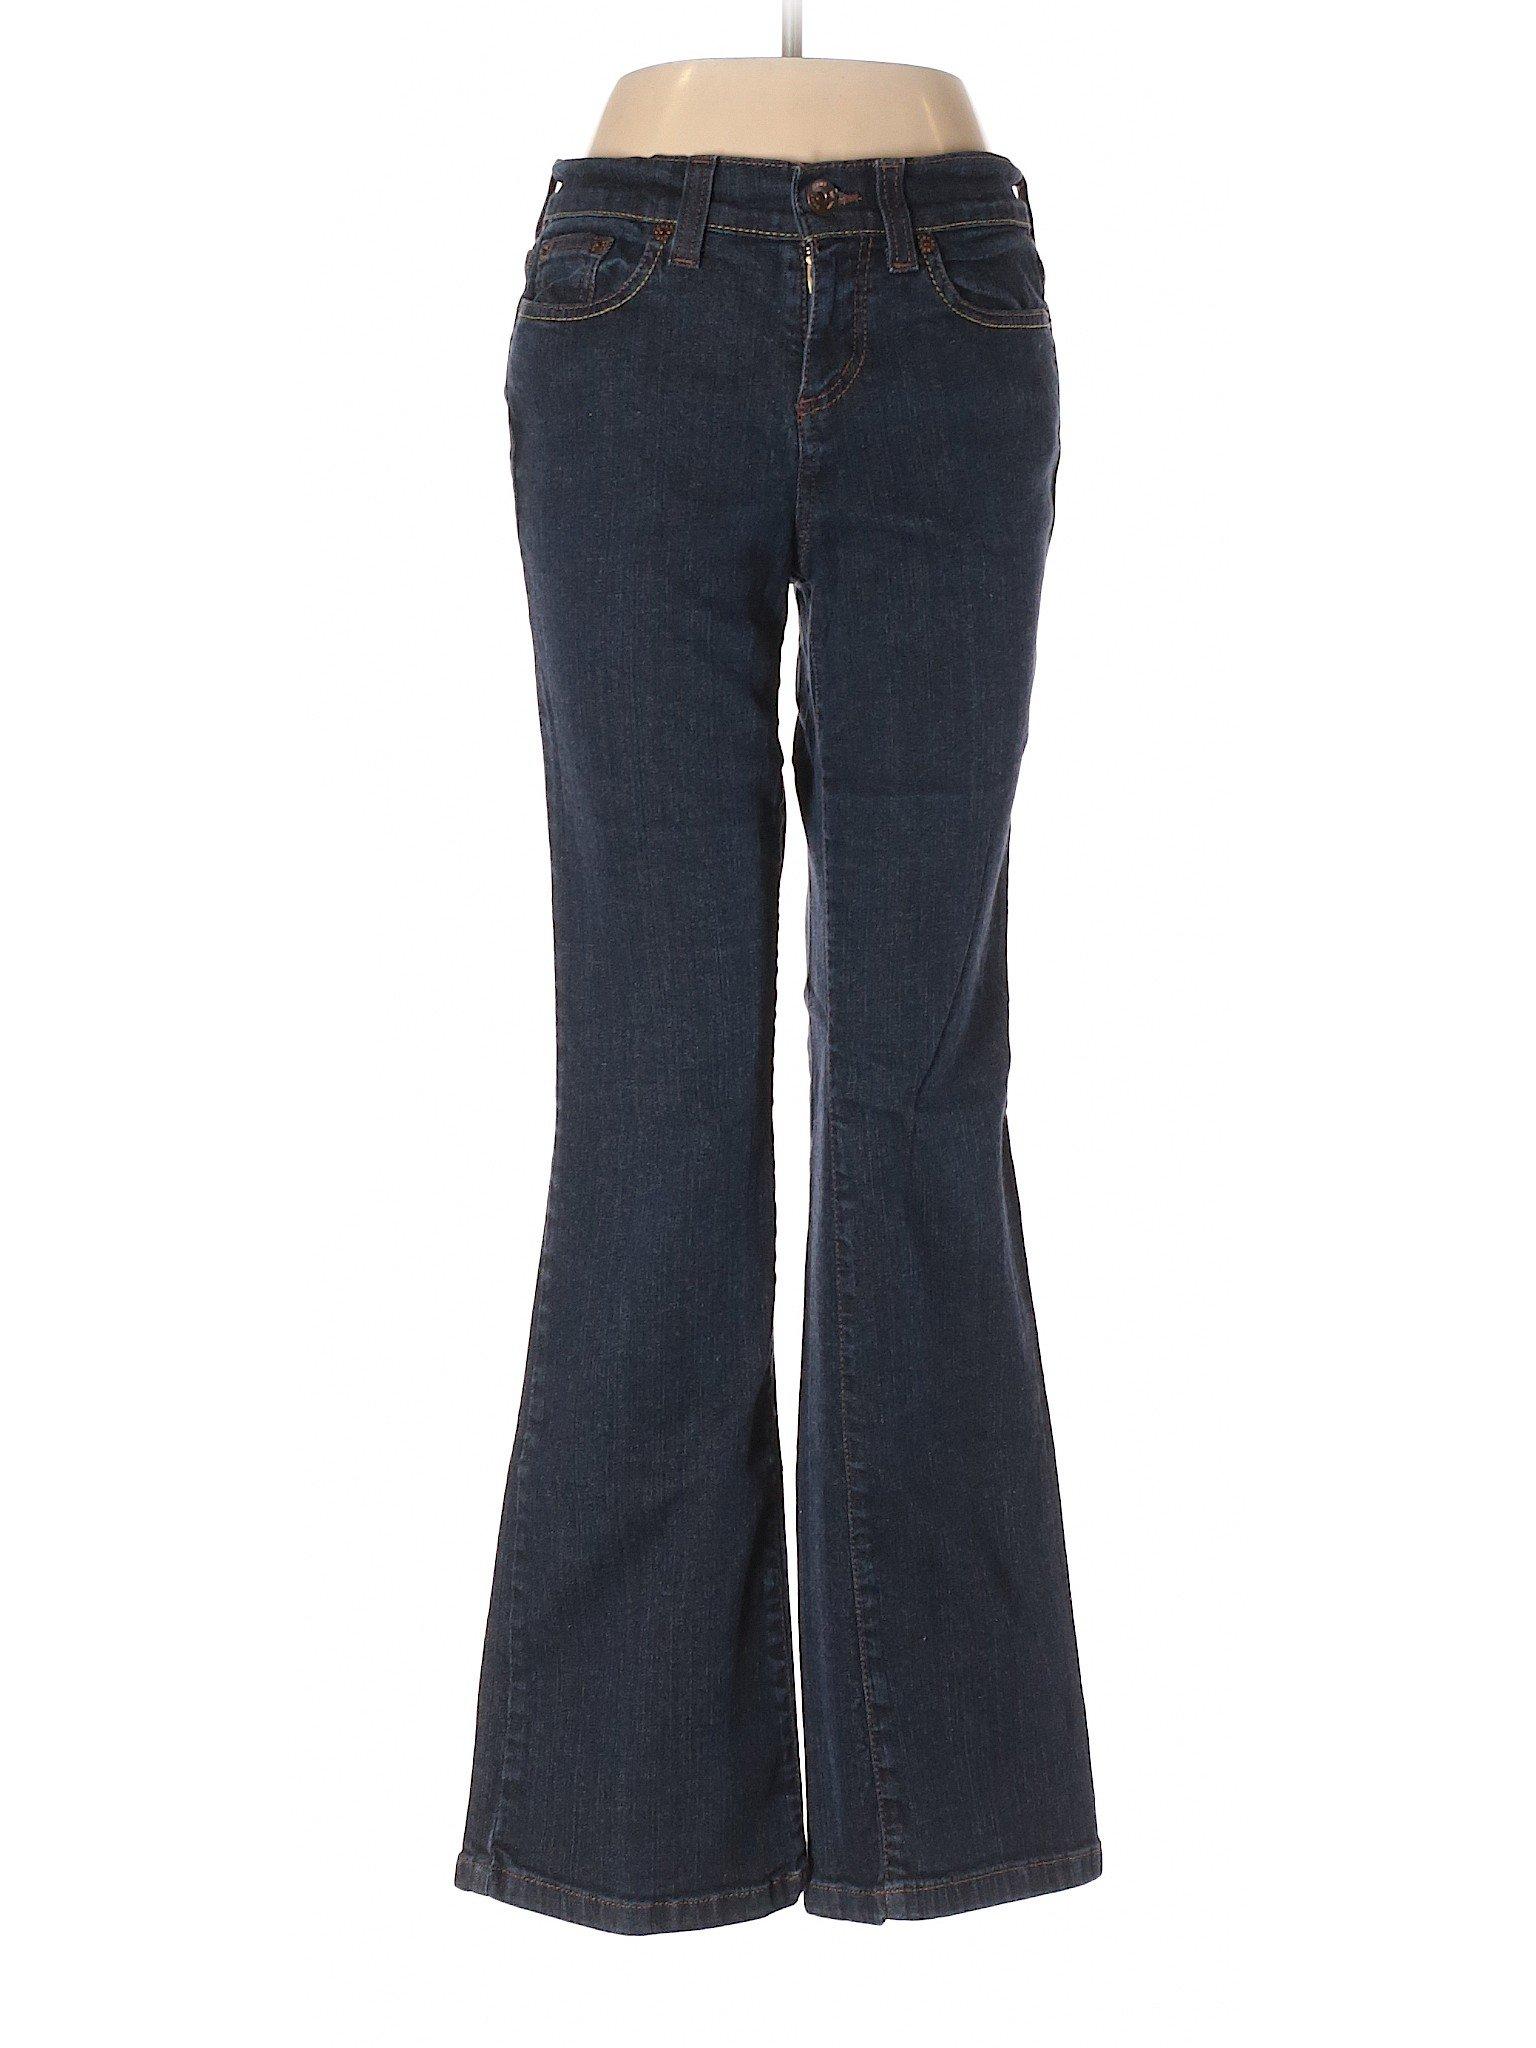 Promotion Promotion DKNY Jeans Jeans DKNY Jeans DKNY Promotion DKNY Jeans DKNY Promotion DKNY Jeans Promotion Promotion wgRdqRB